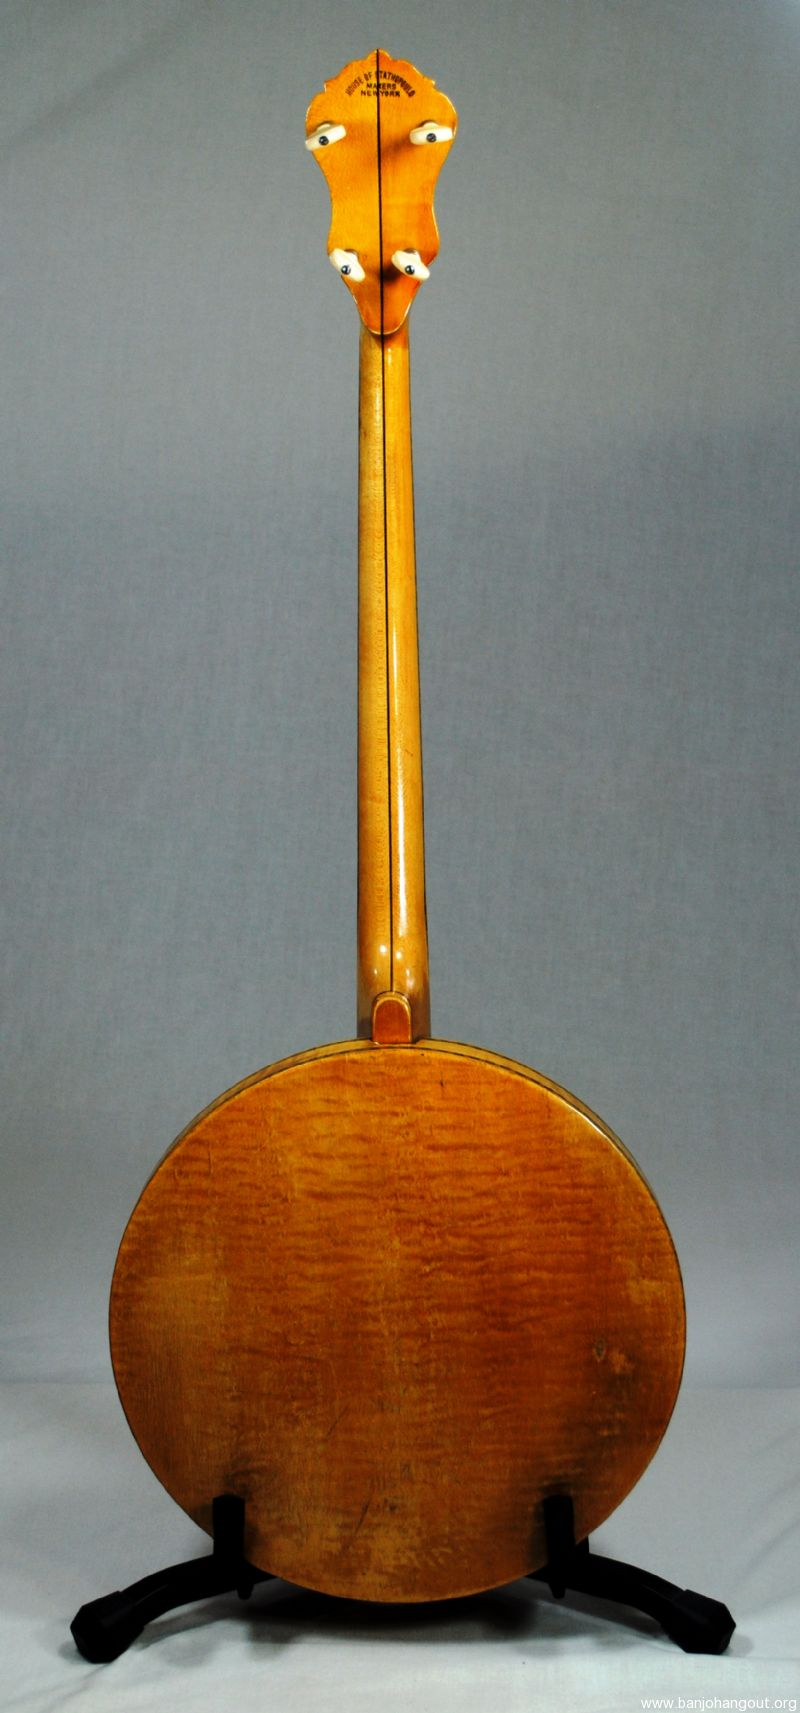 EPIPHONE RECORDING A TENOR BANJO - Used Banjo For Sale at